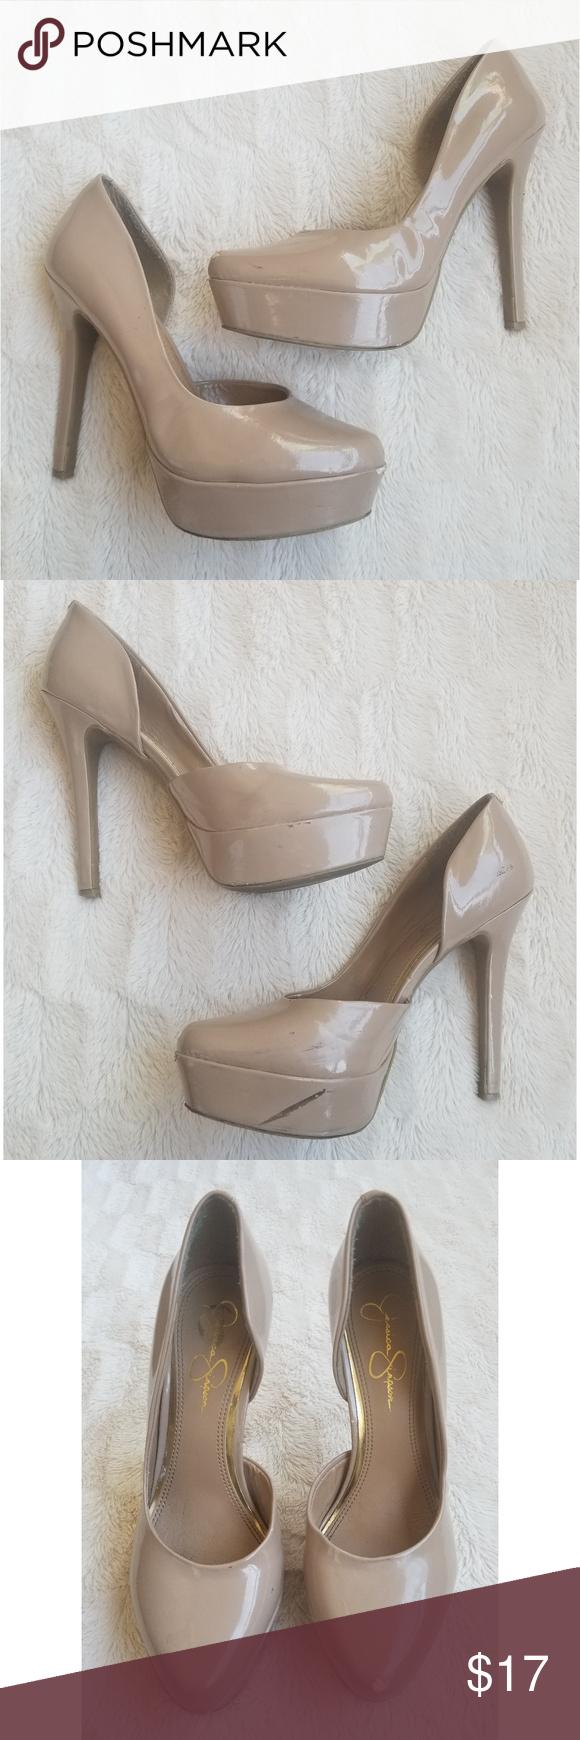 06669cbc439 Jessica Simpson JP Walea Nude Platform heels Jessica Simpson JP ...